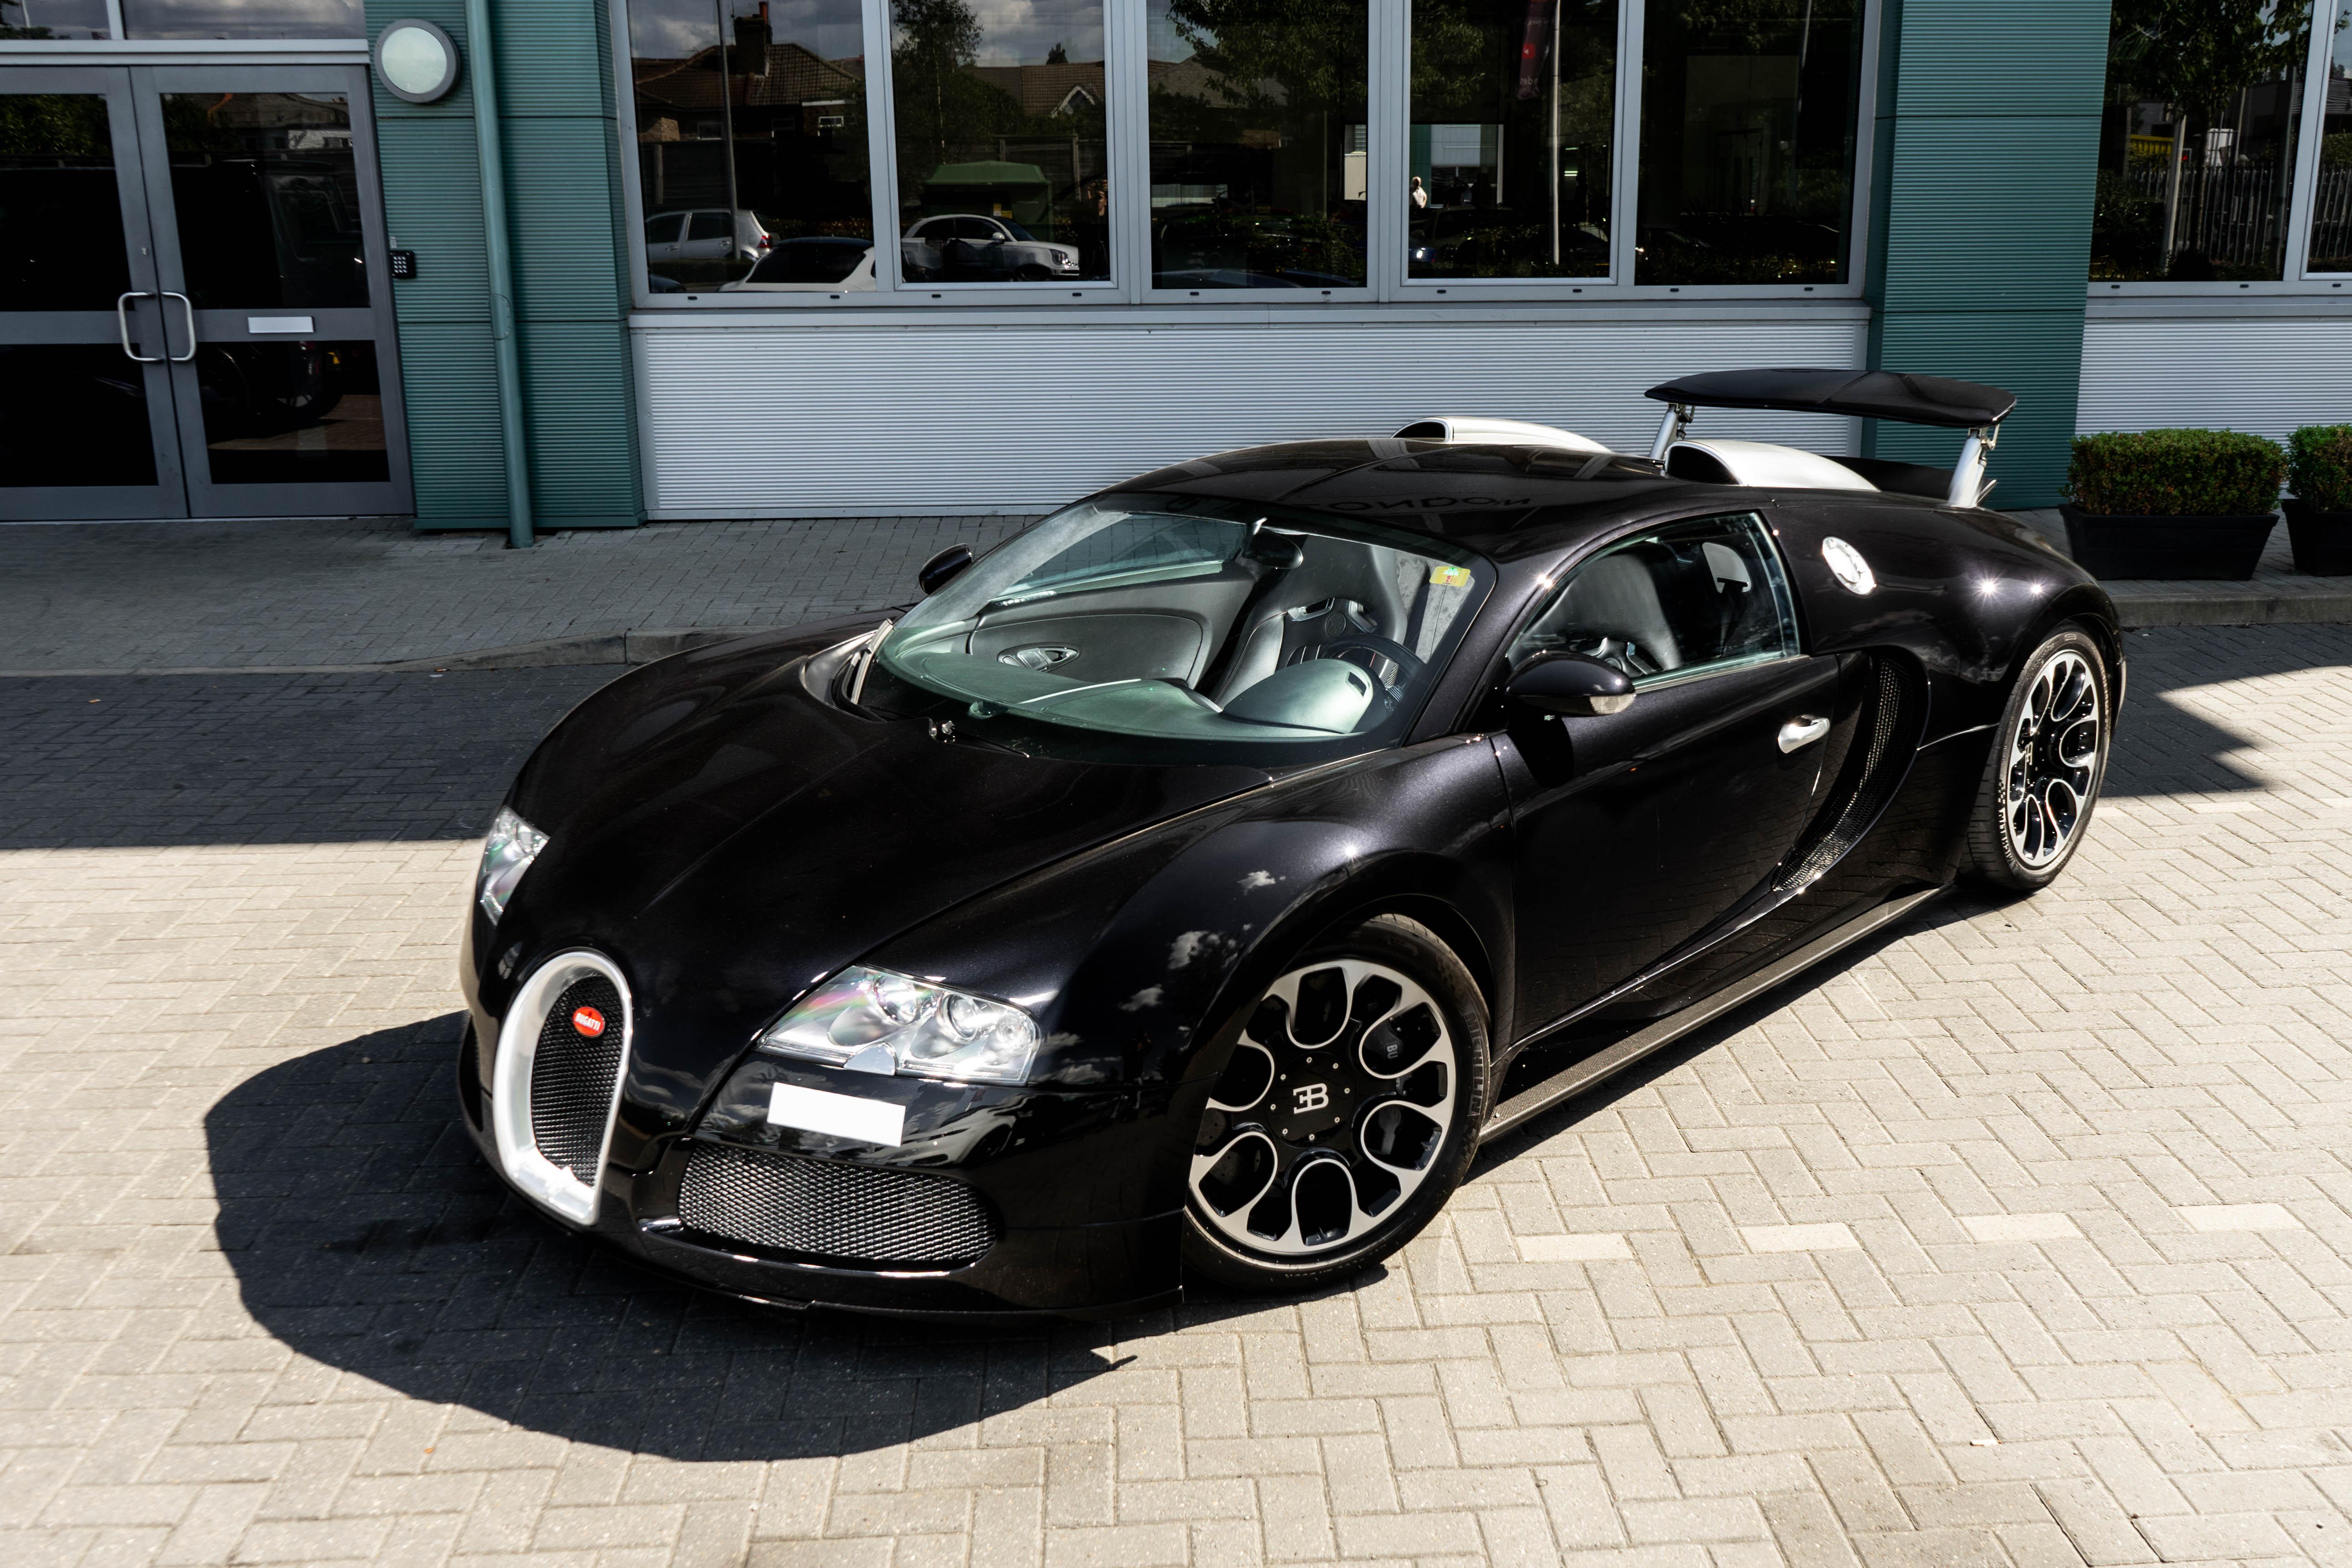 Bugatti Veyron | Largest Supercar Dealership in the UK | West London